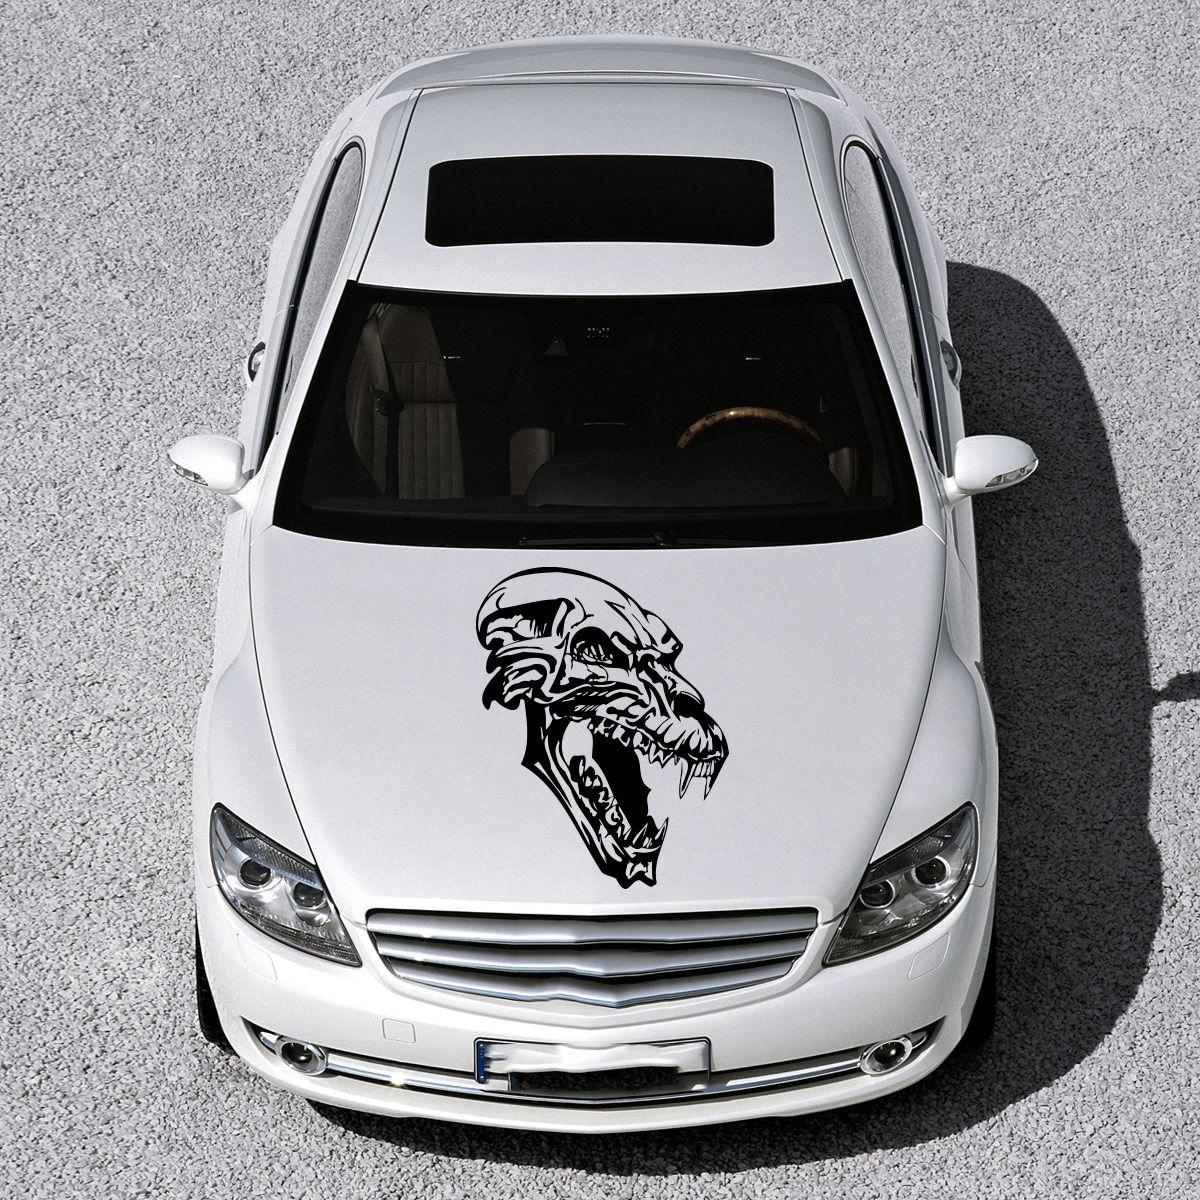 Car body sticker design eps - Car Hood Vinyl Sticker Decals Graphics Design Art Skull Monster Tattoo Sv4851 China Mainland